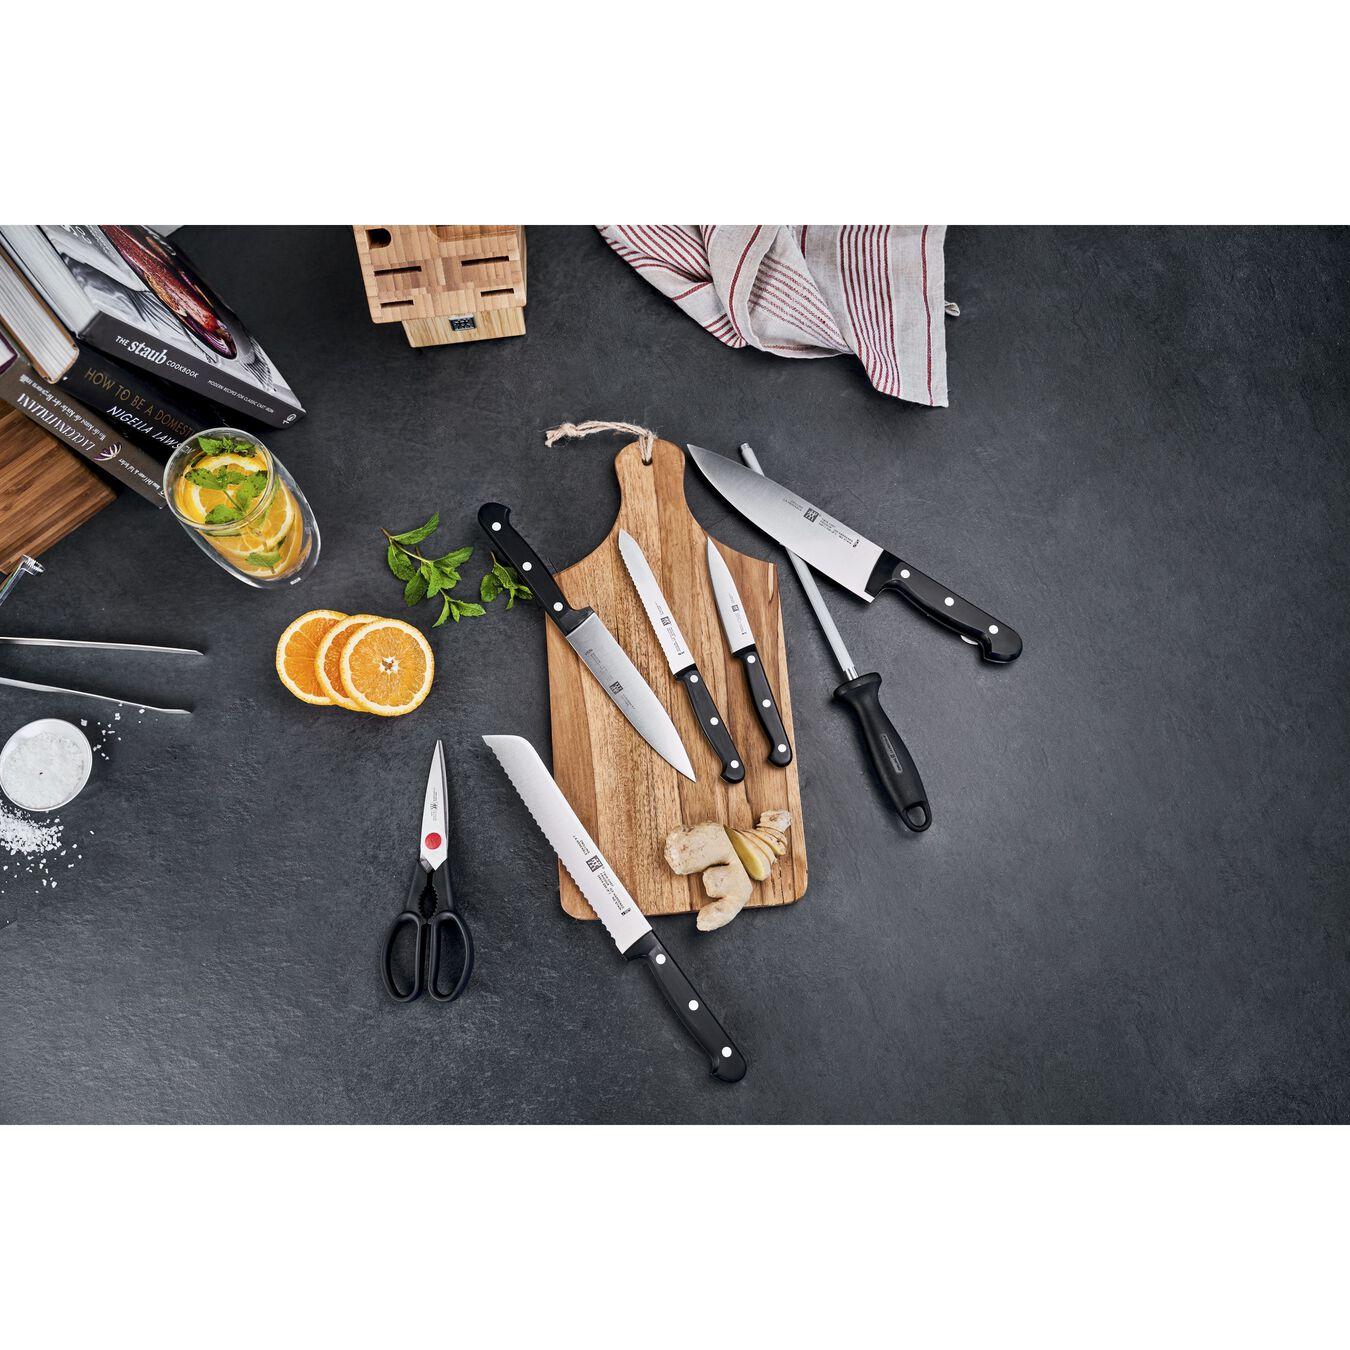 Blok Bıçak Seti | Özel Formül Çelik | 8-adet,,large 2